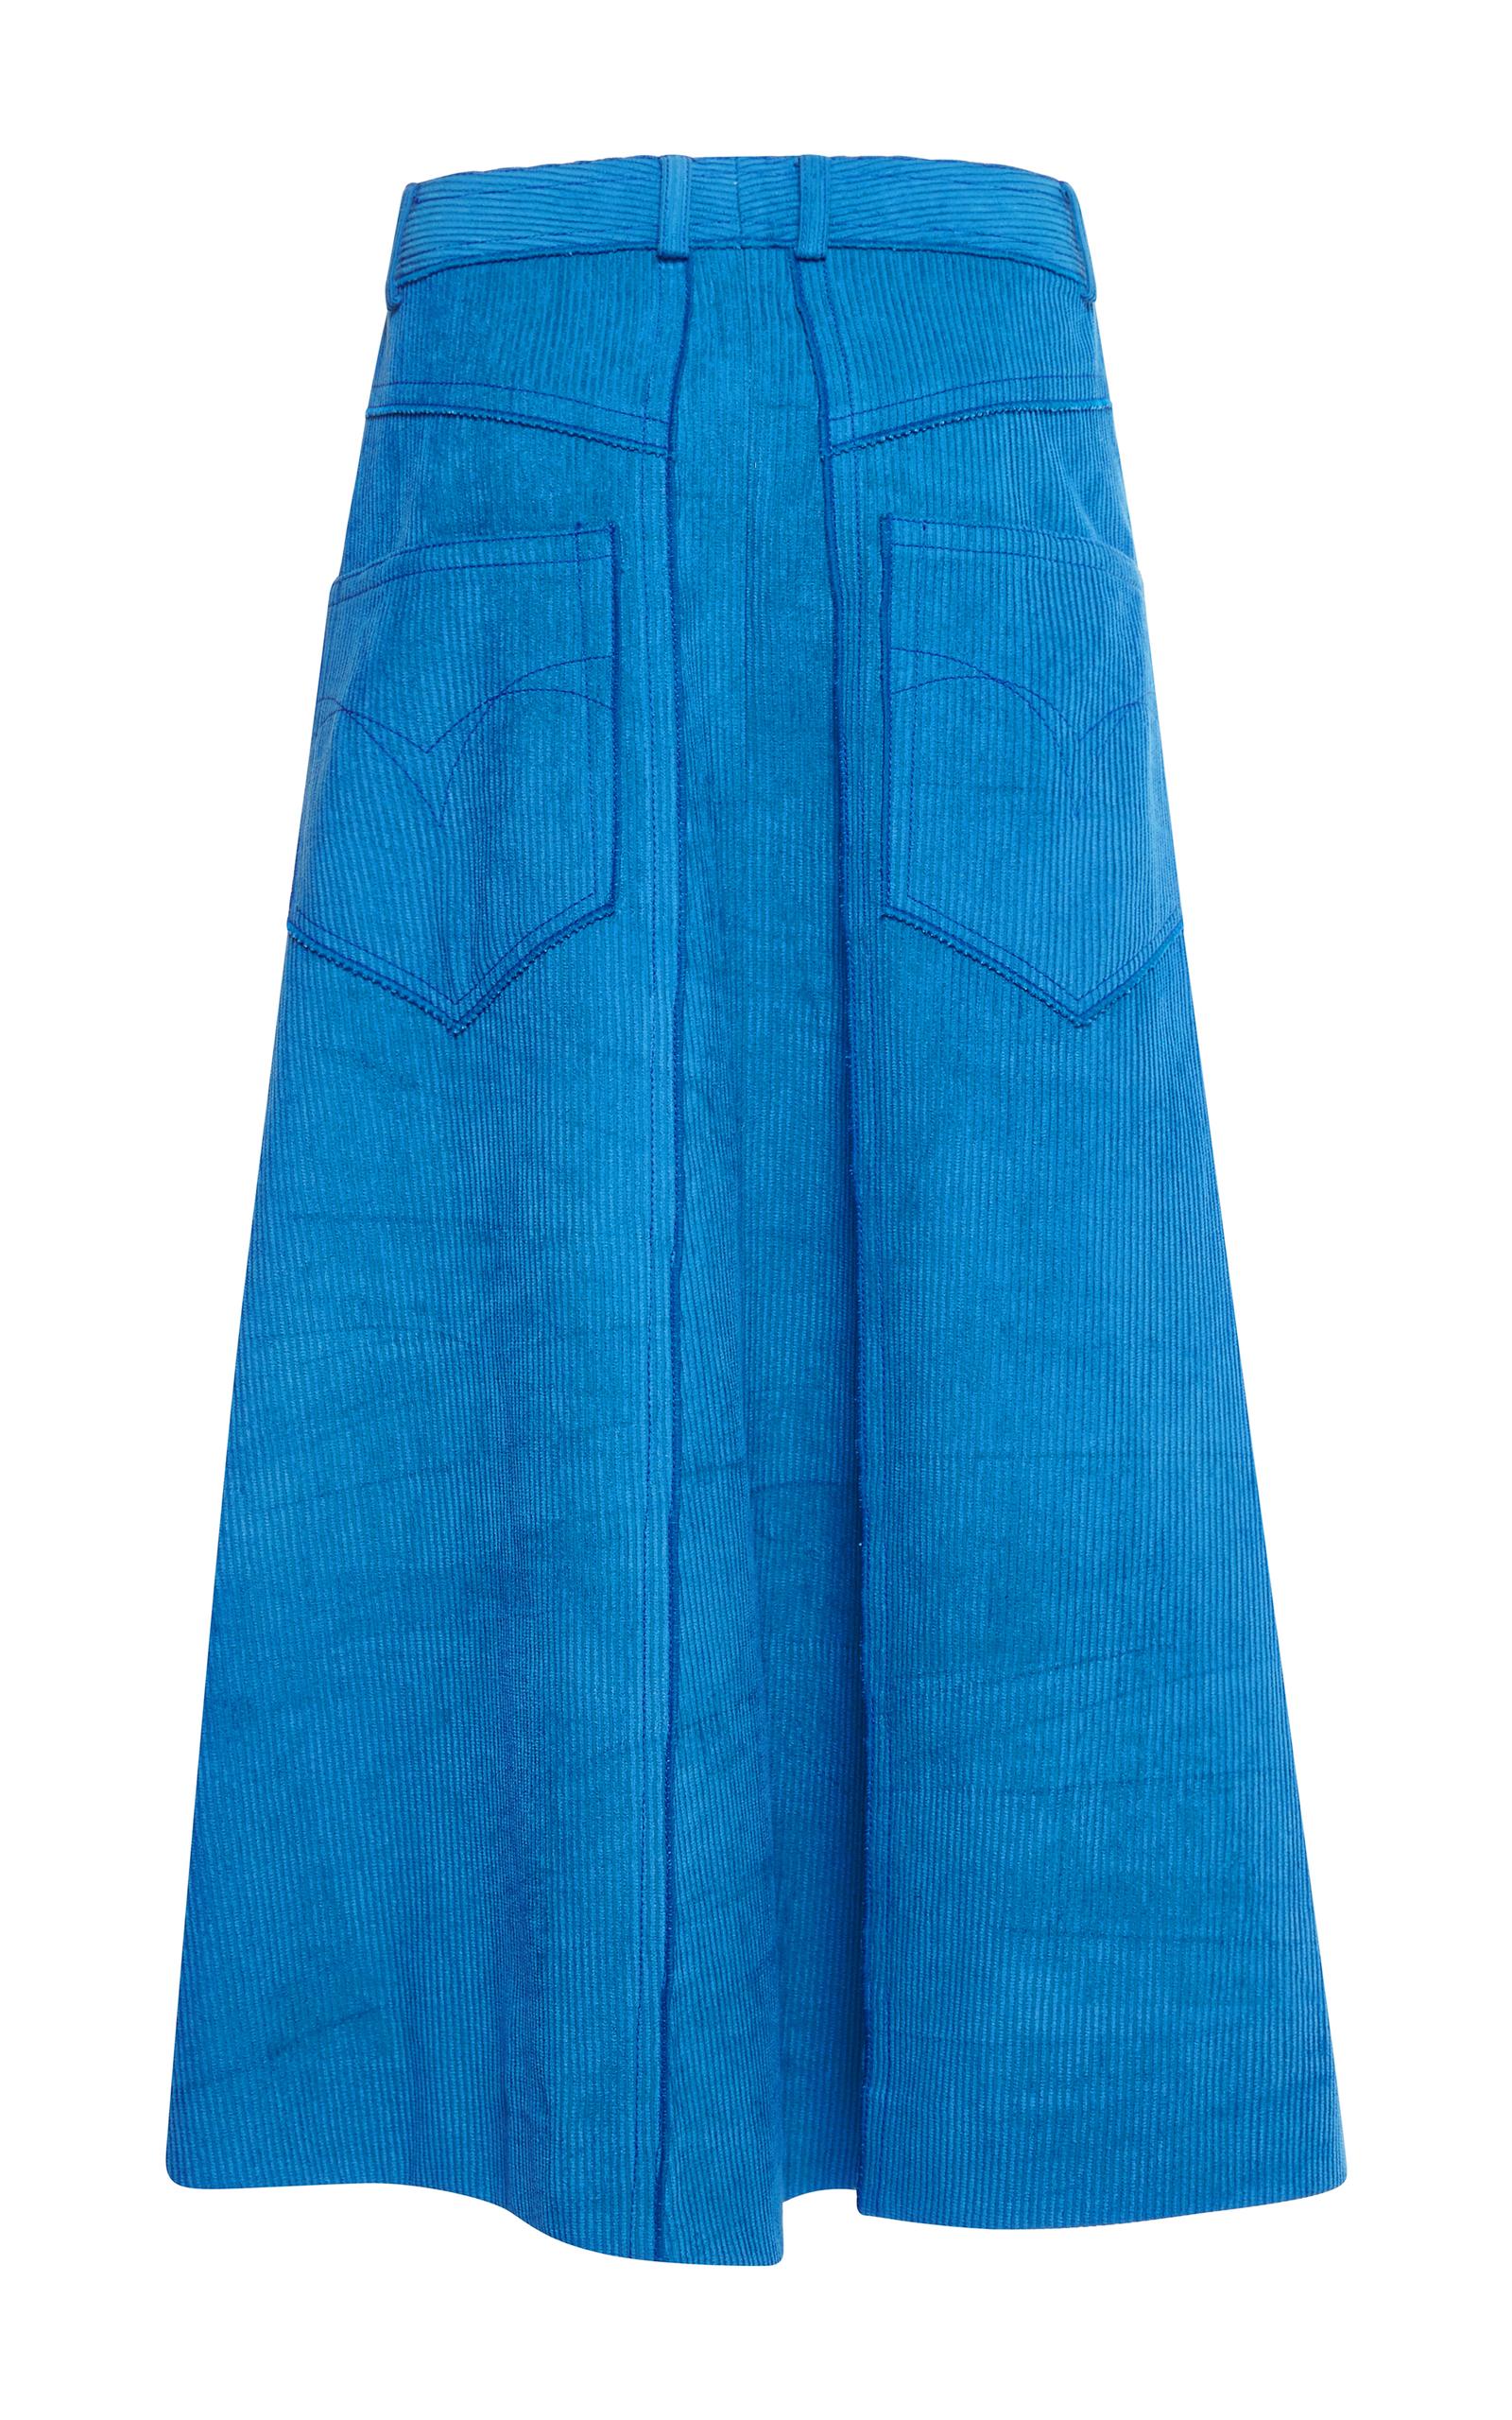 corduroy a line skirt by ricci moda operandi